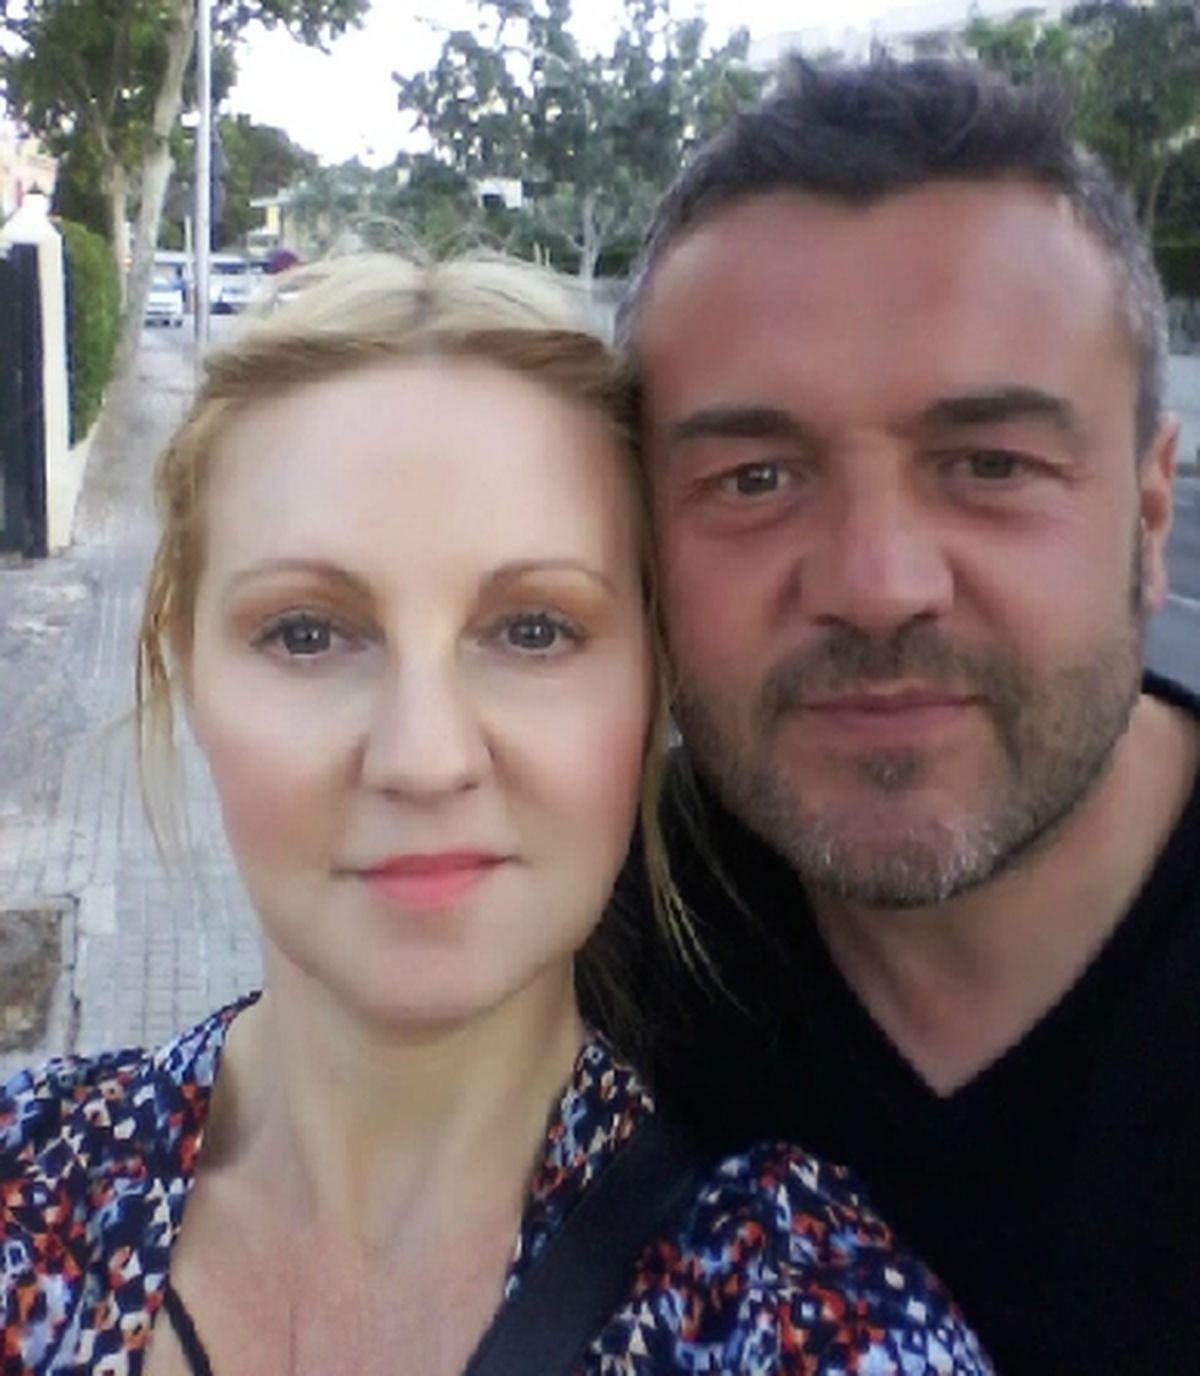 Simon Smith with his wife, Hayley